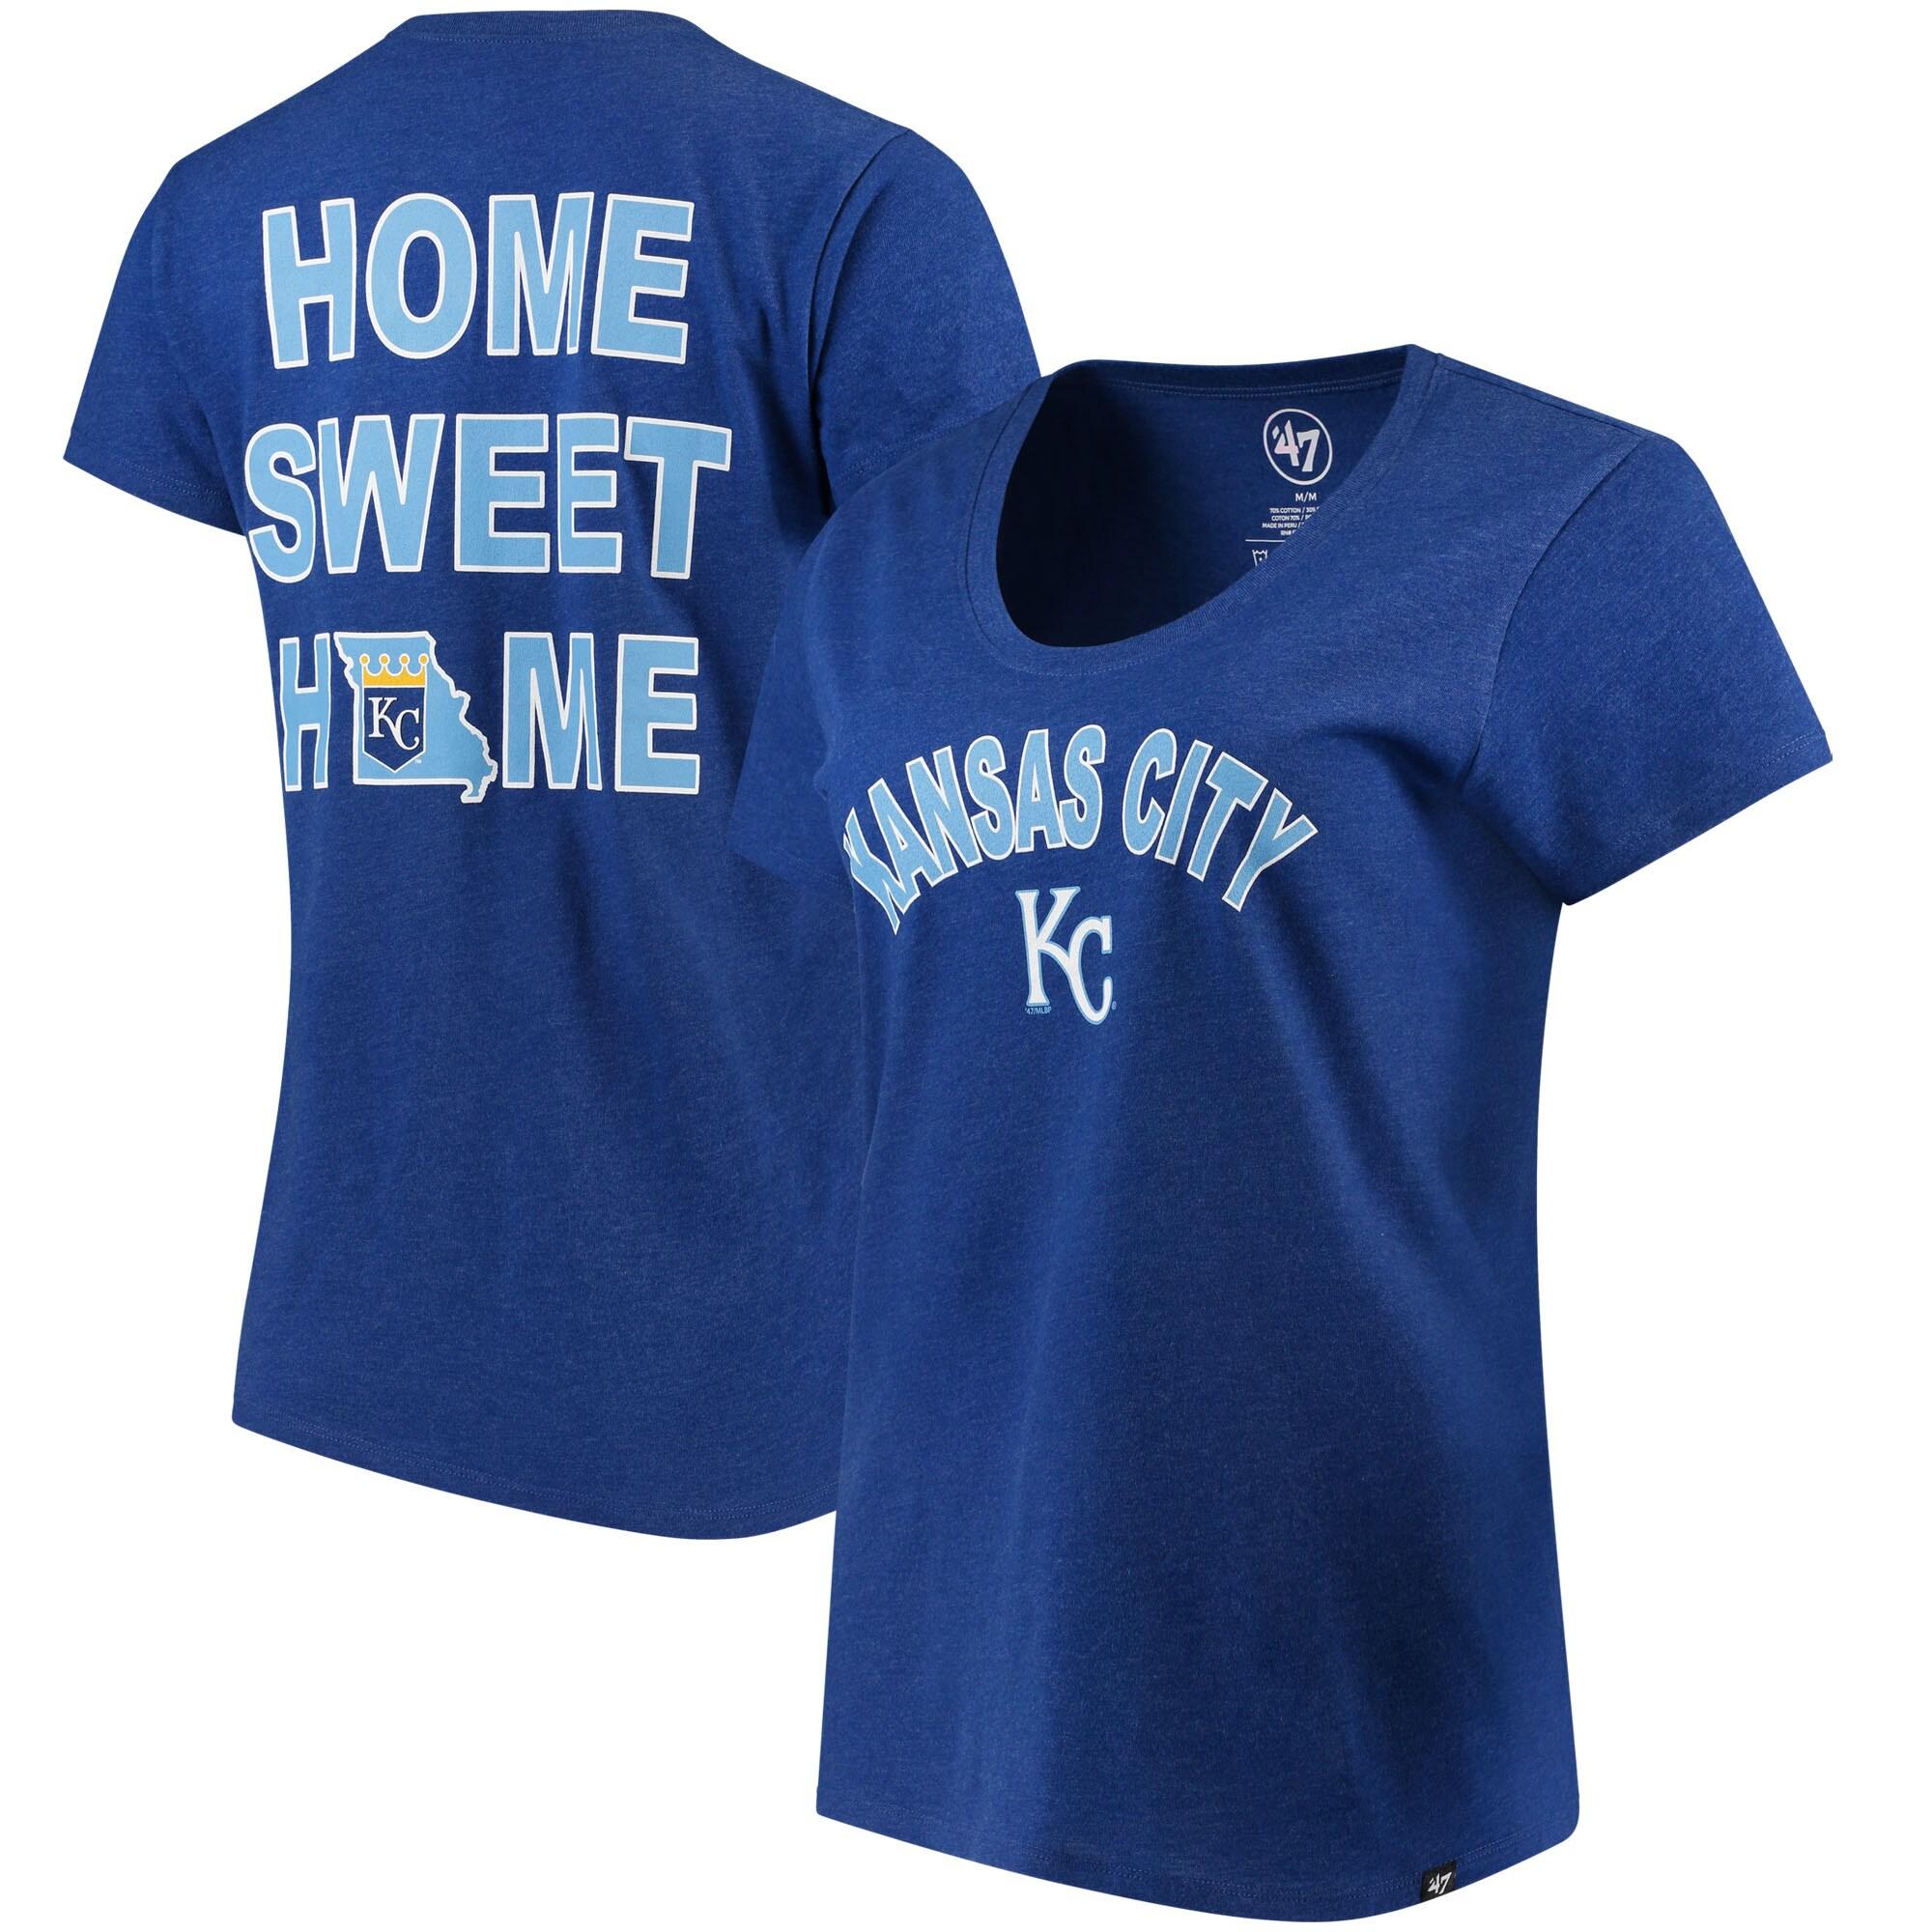 Kansas City Royals '47 Women's Club Scoop Neck T-Shirt - Royal